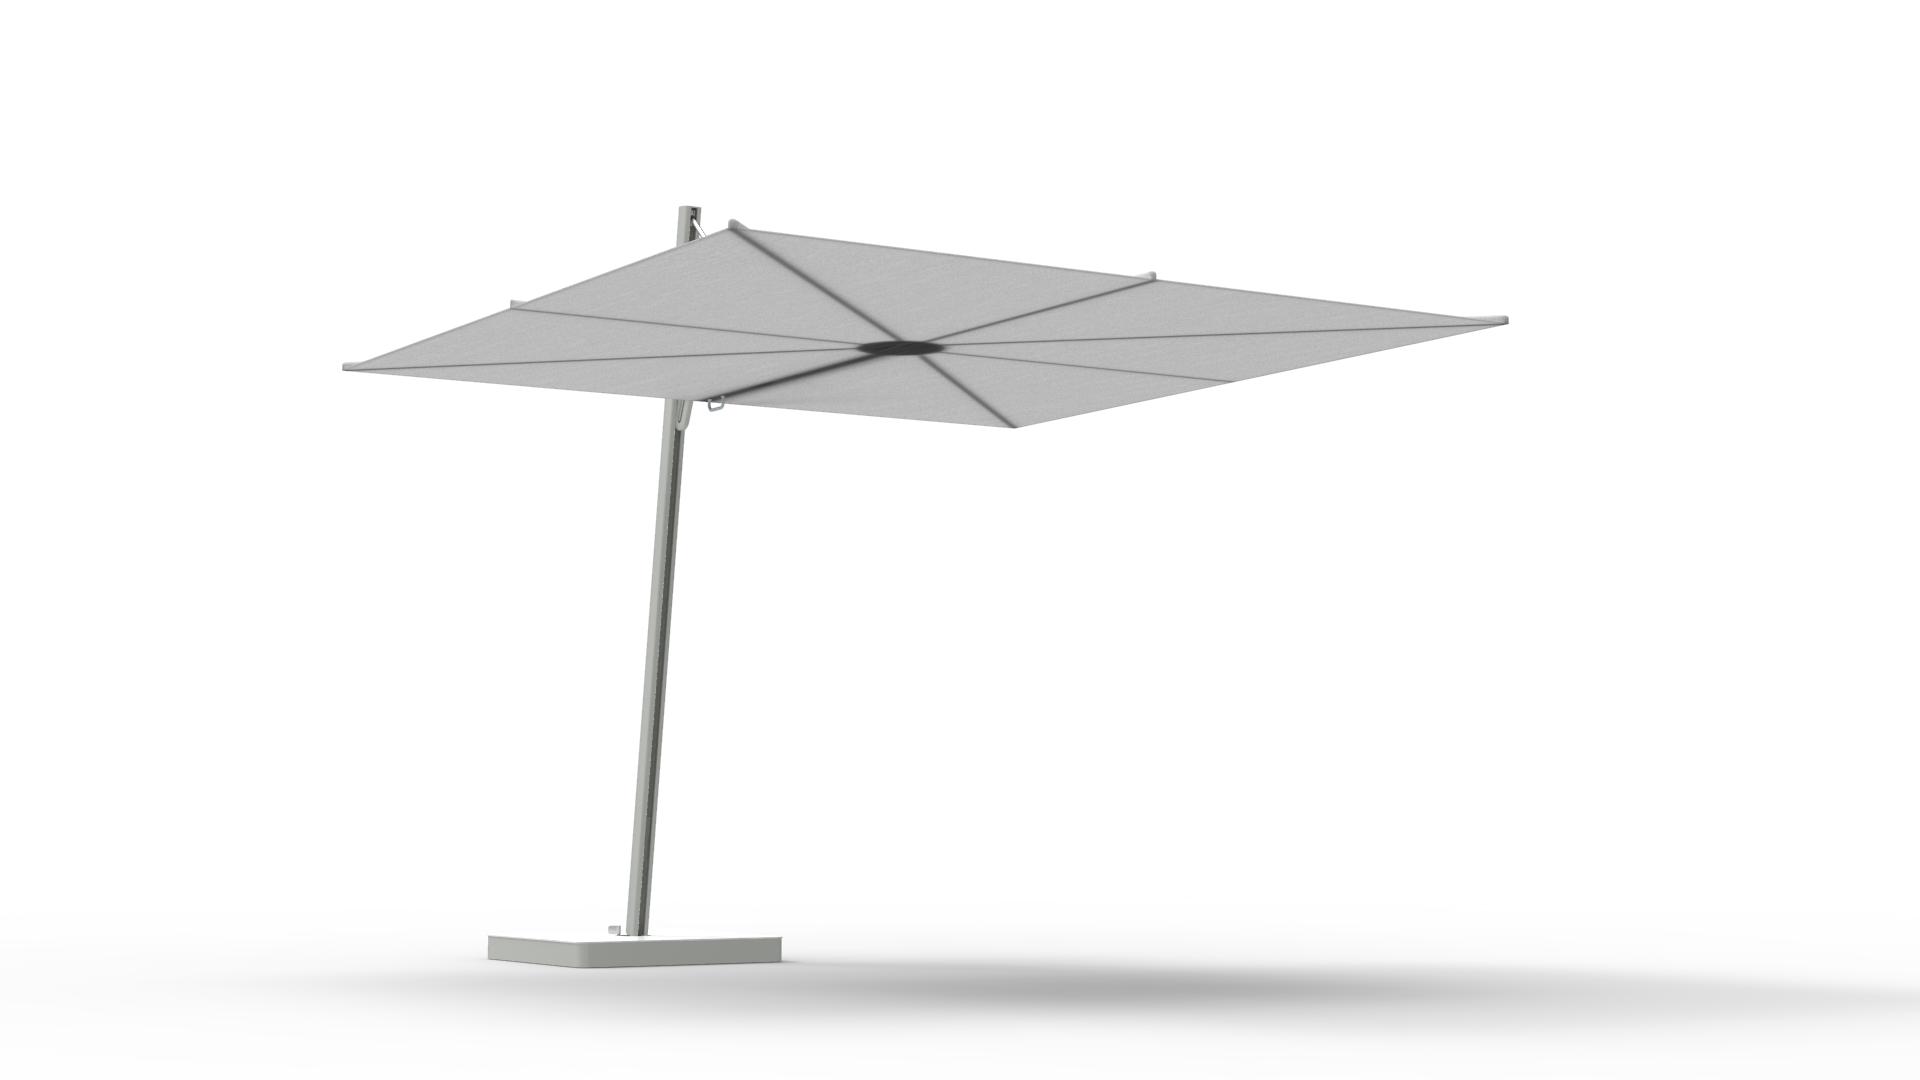 SPECTRA UX Architecture